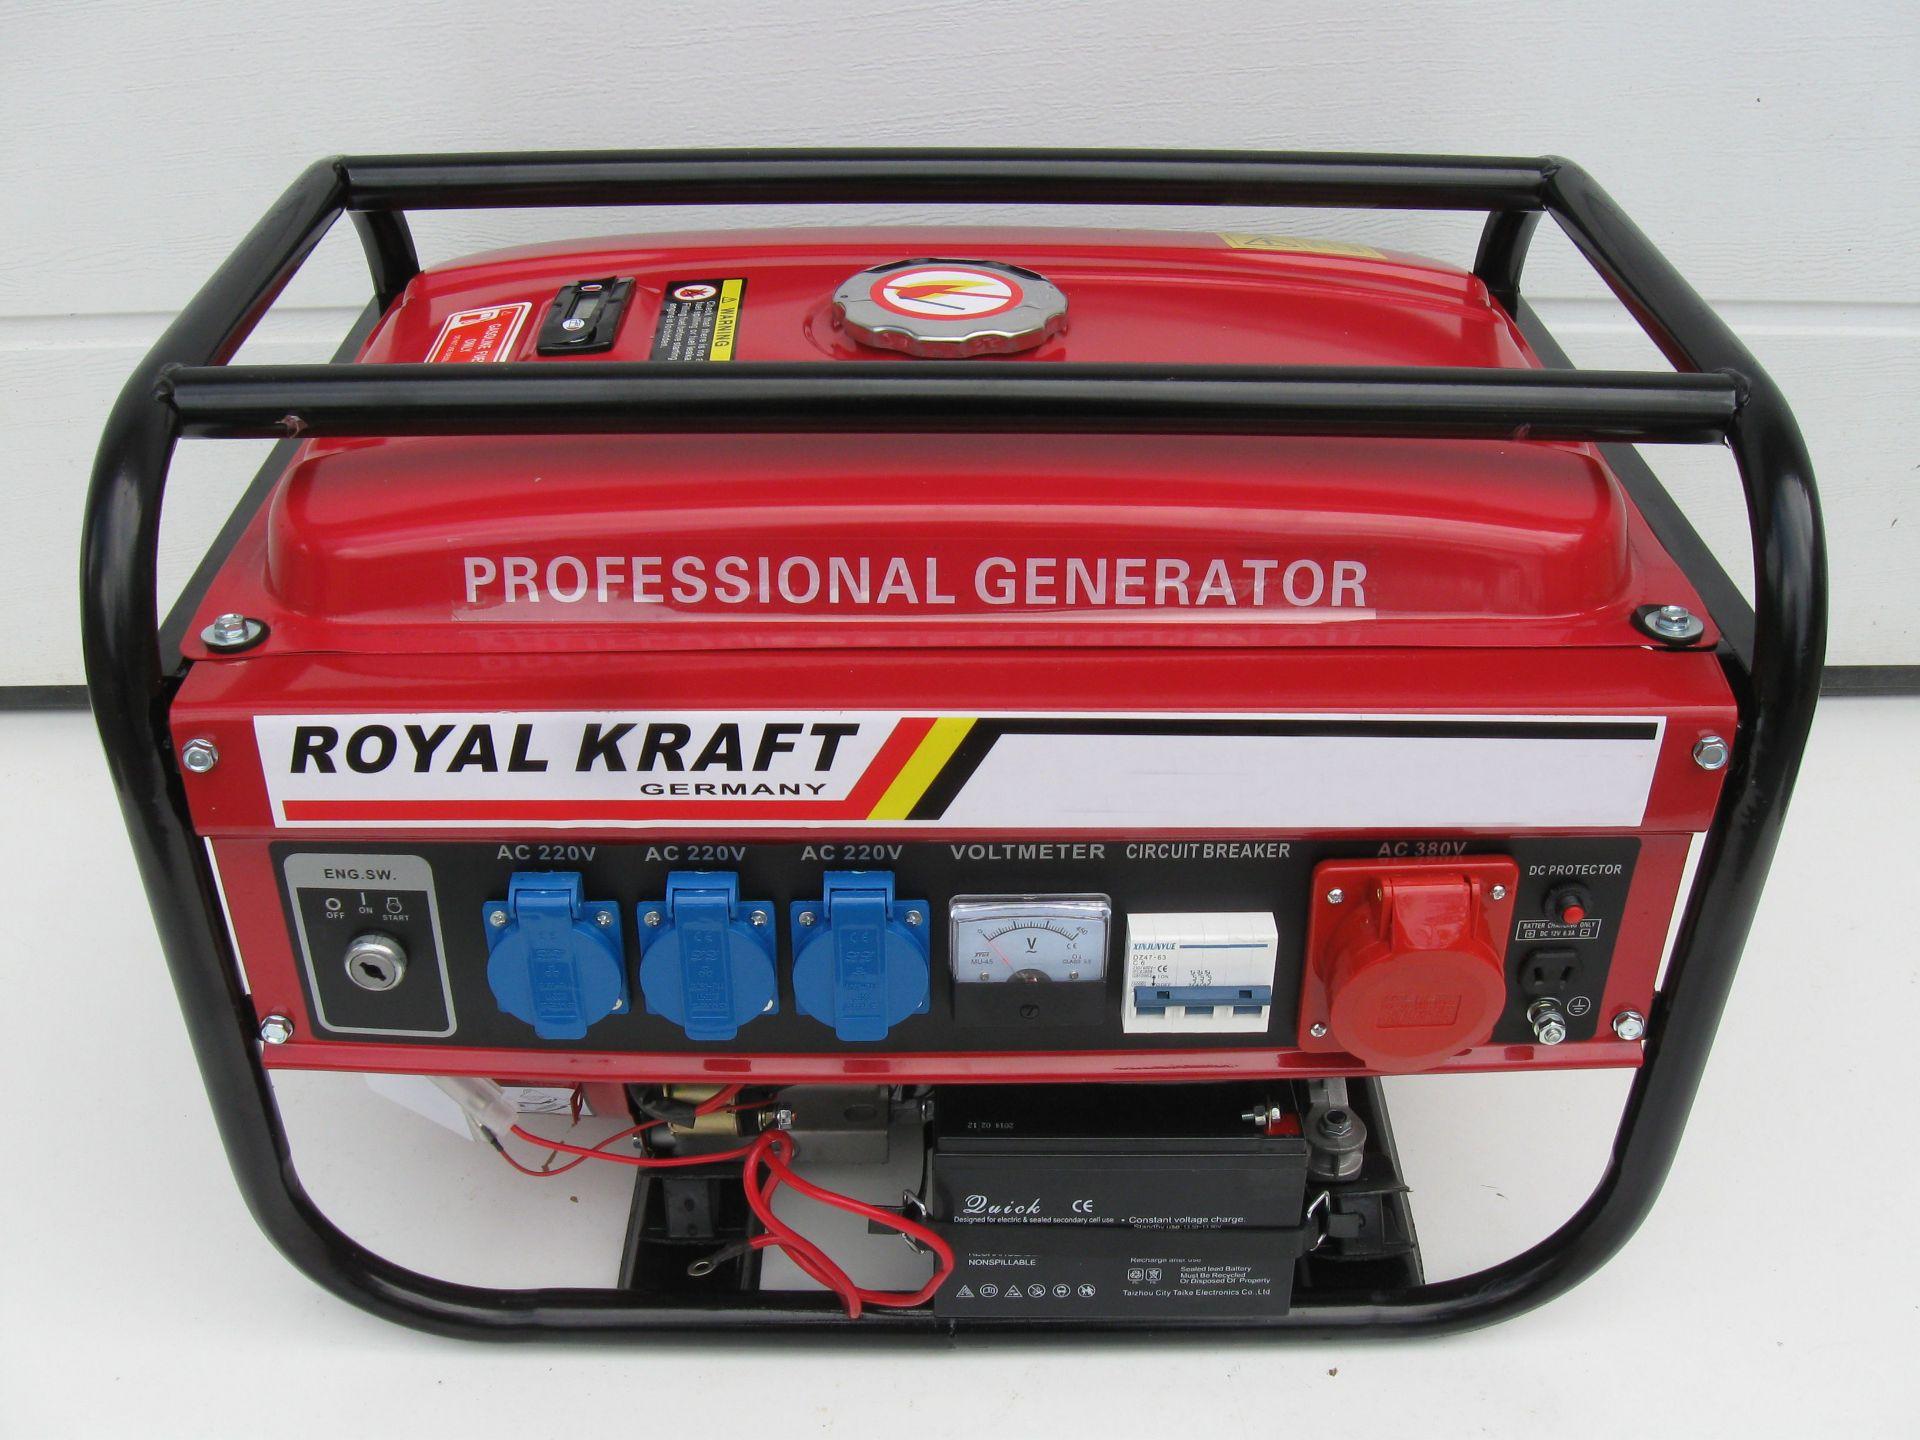 Lot 51243 - V Brand New Electric Start Generator 220V/380V 50Hz In Metal Frame 6.5HP - Approx 40KG - Available